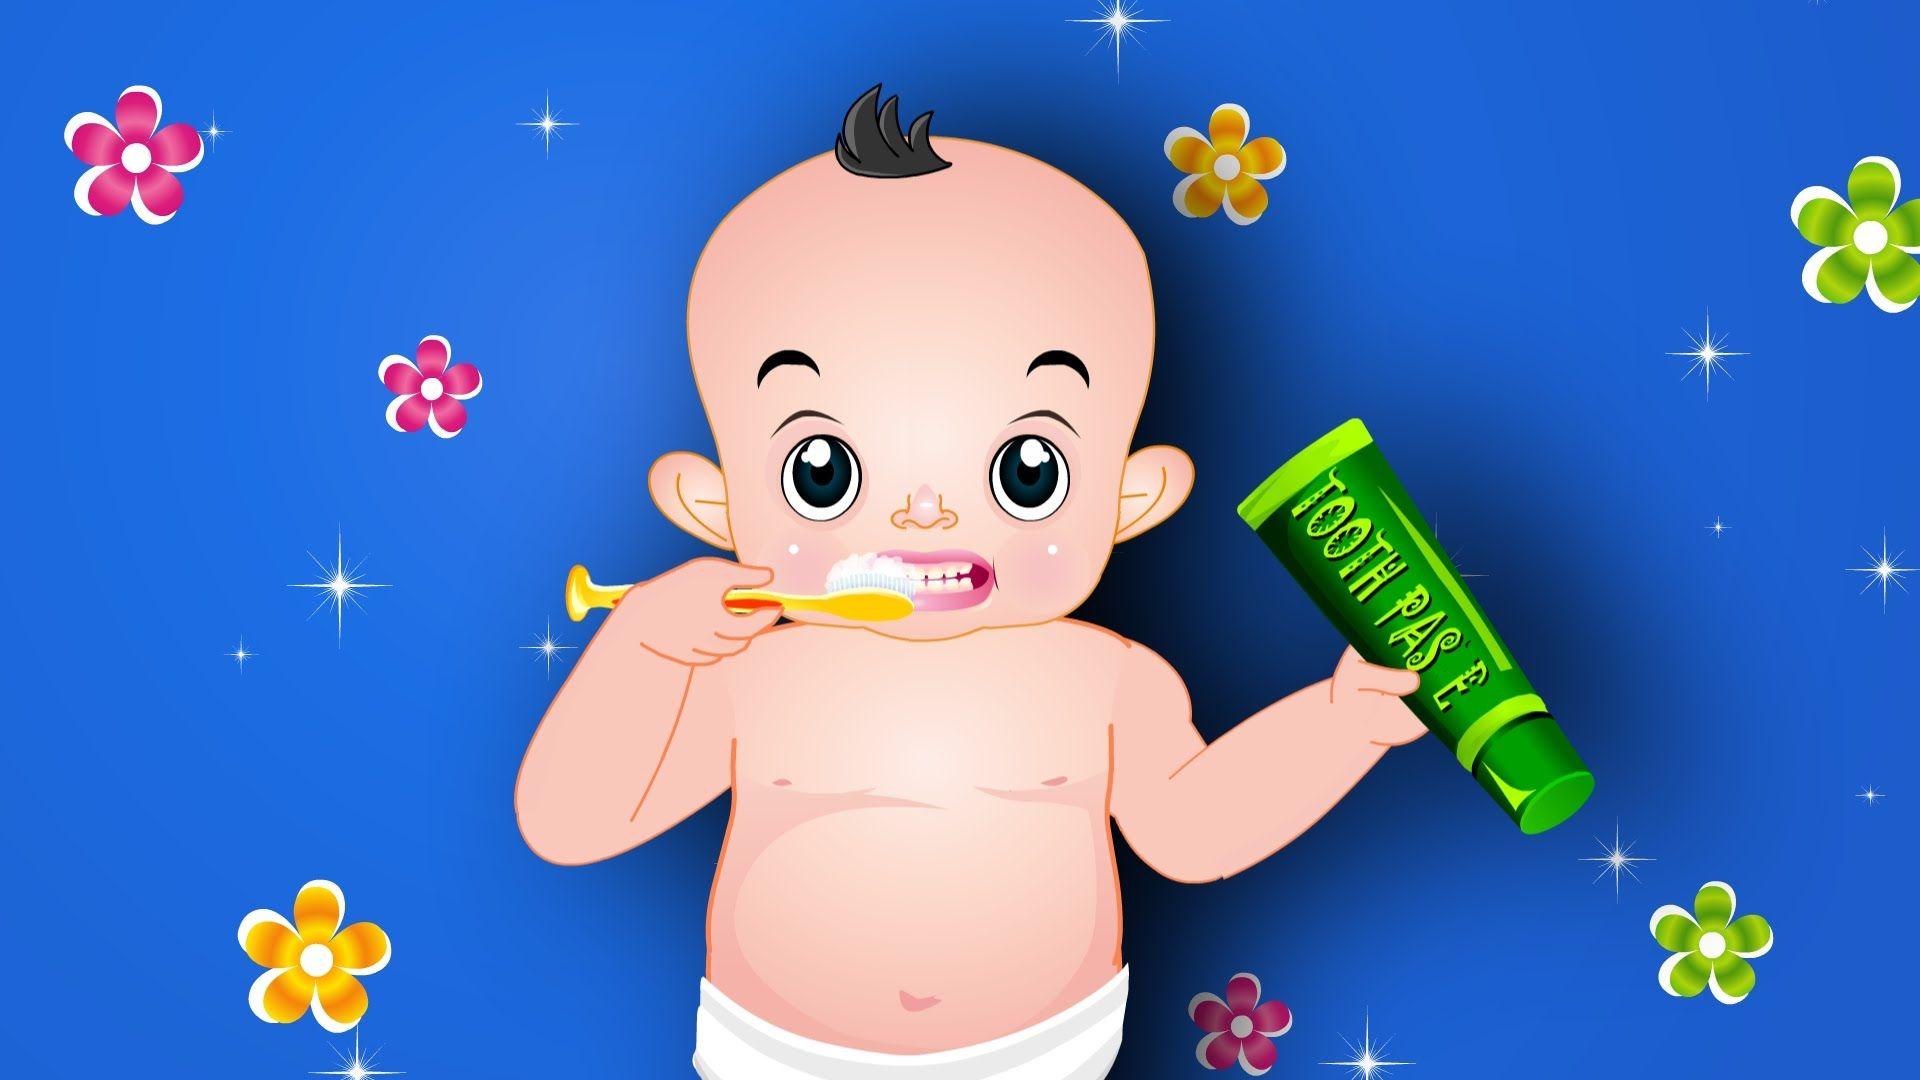 Brush Your Teeth Nursery Rhyme ,The Good Habits Song ,Baby